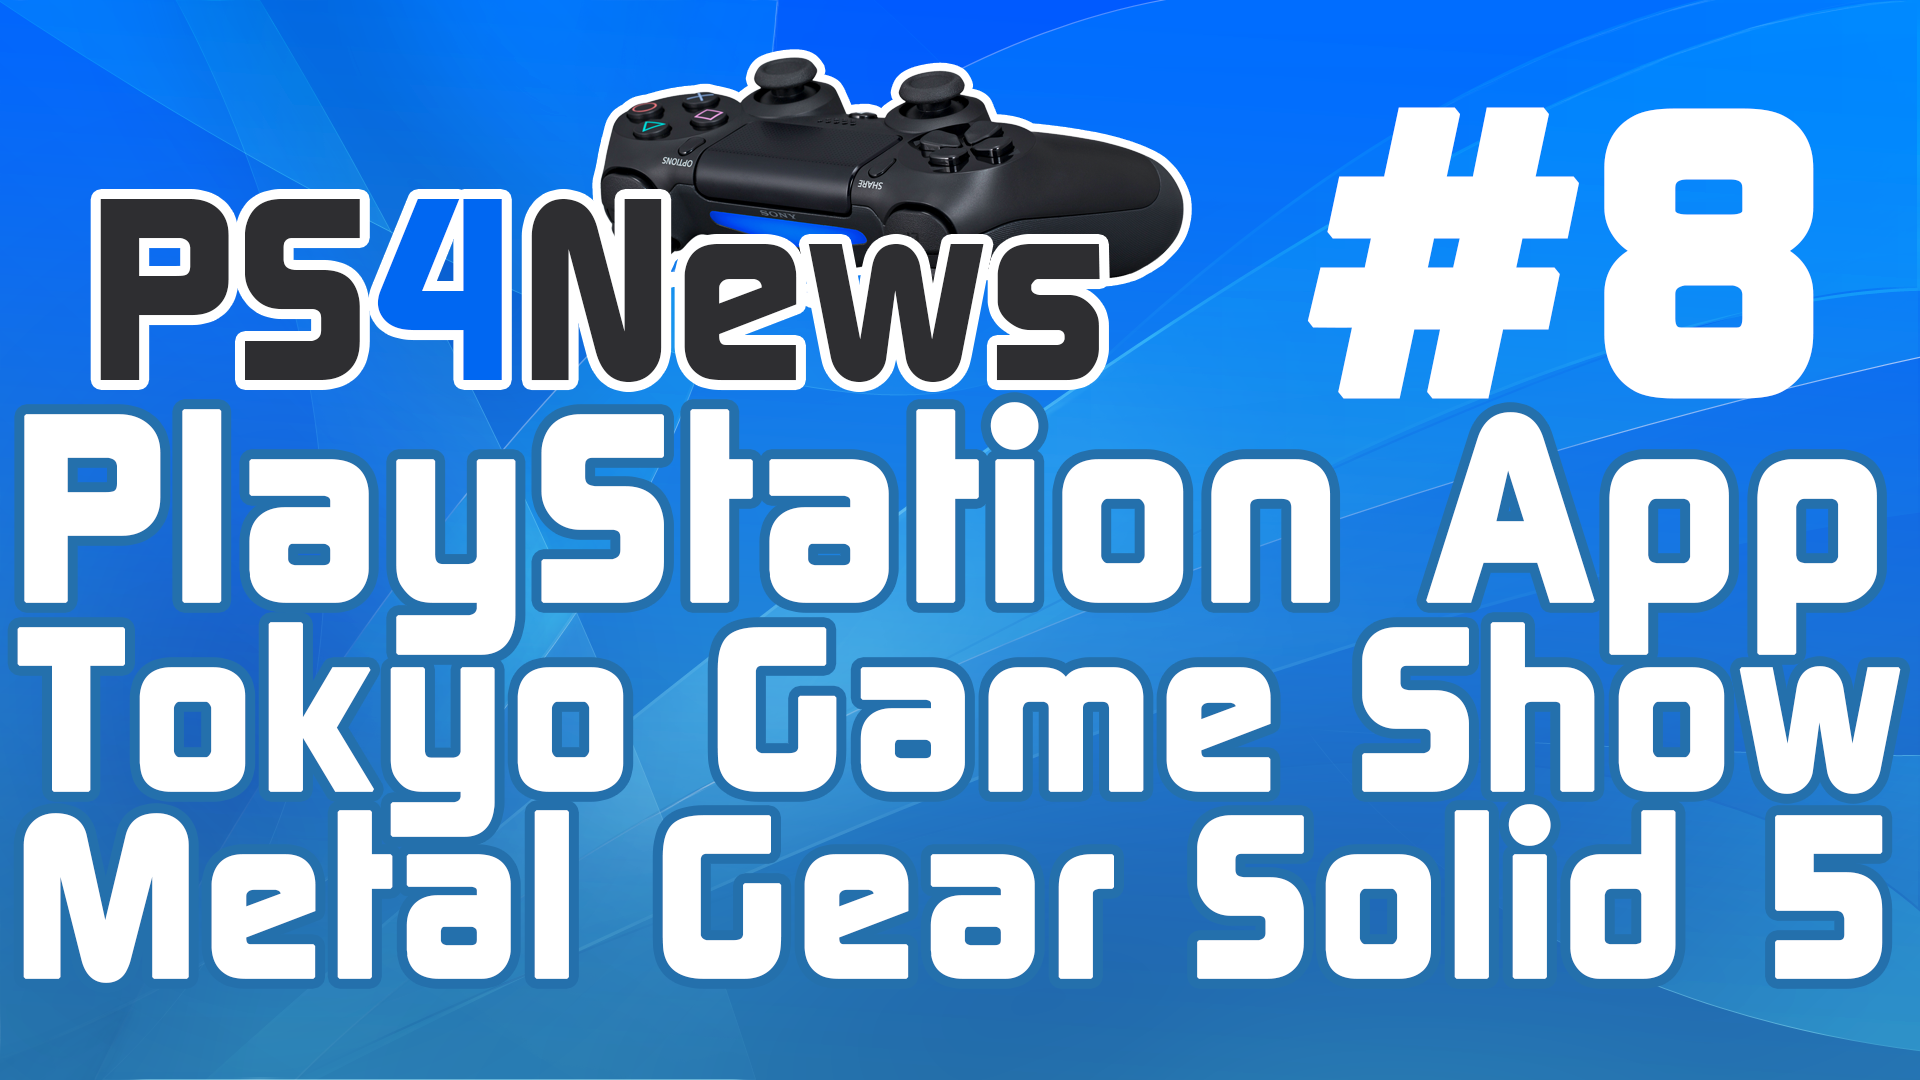 PS4News #8 Die PlayStation App – Tokyo Game Show News – Metal Gear Solid 5